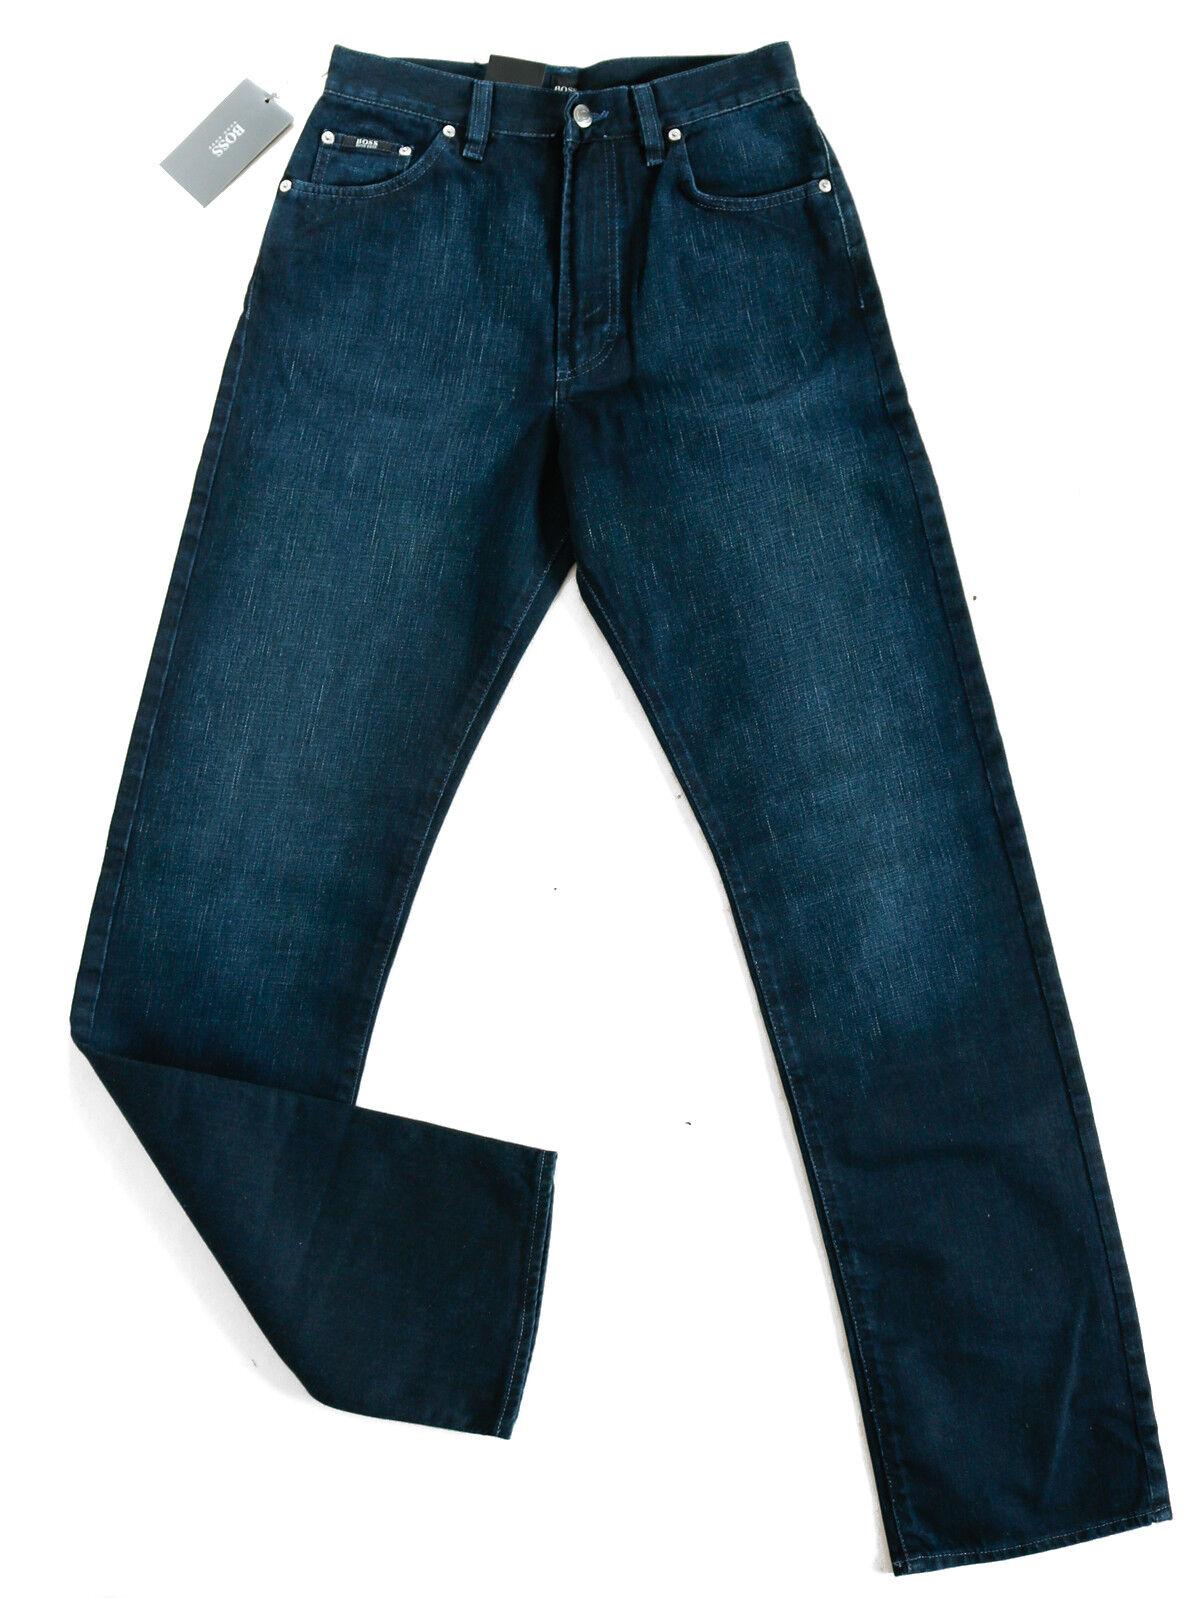 Hugo BOSS   Uomo Jeans-Pantaloni   Montana regular Comfort Fit   blu   w28-w30